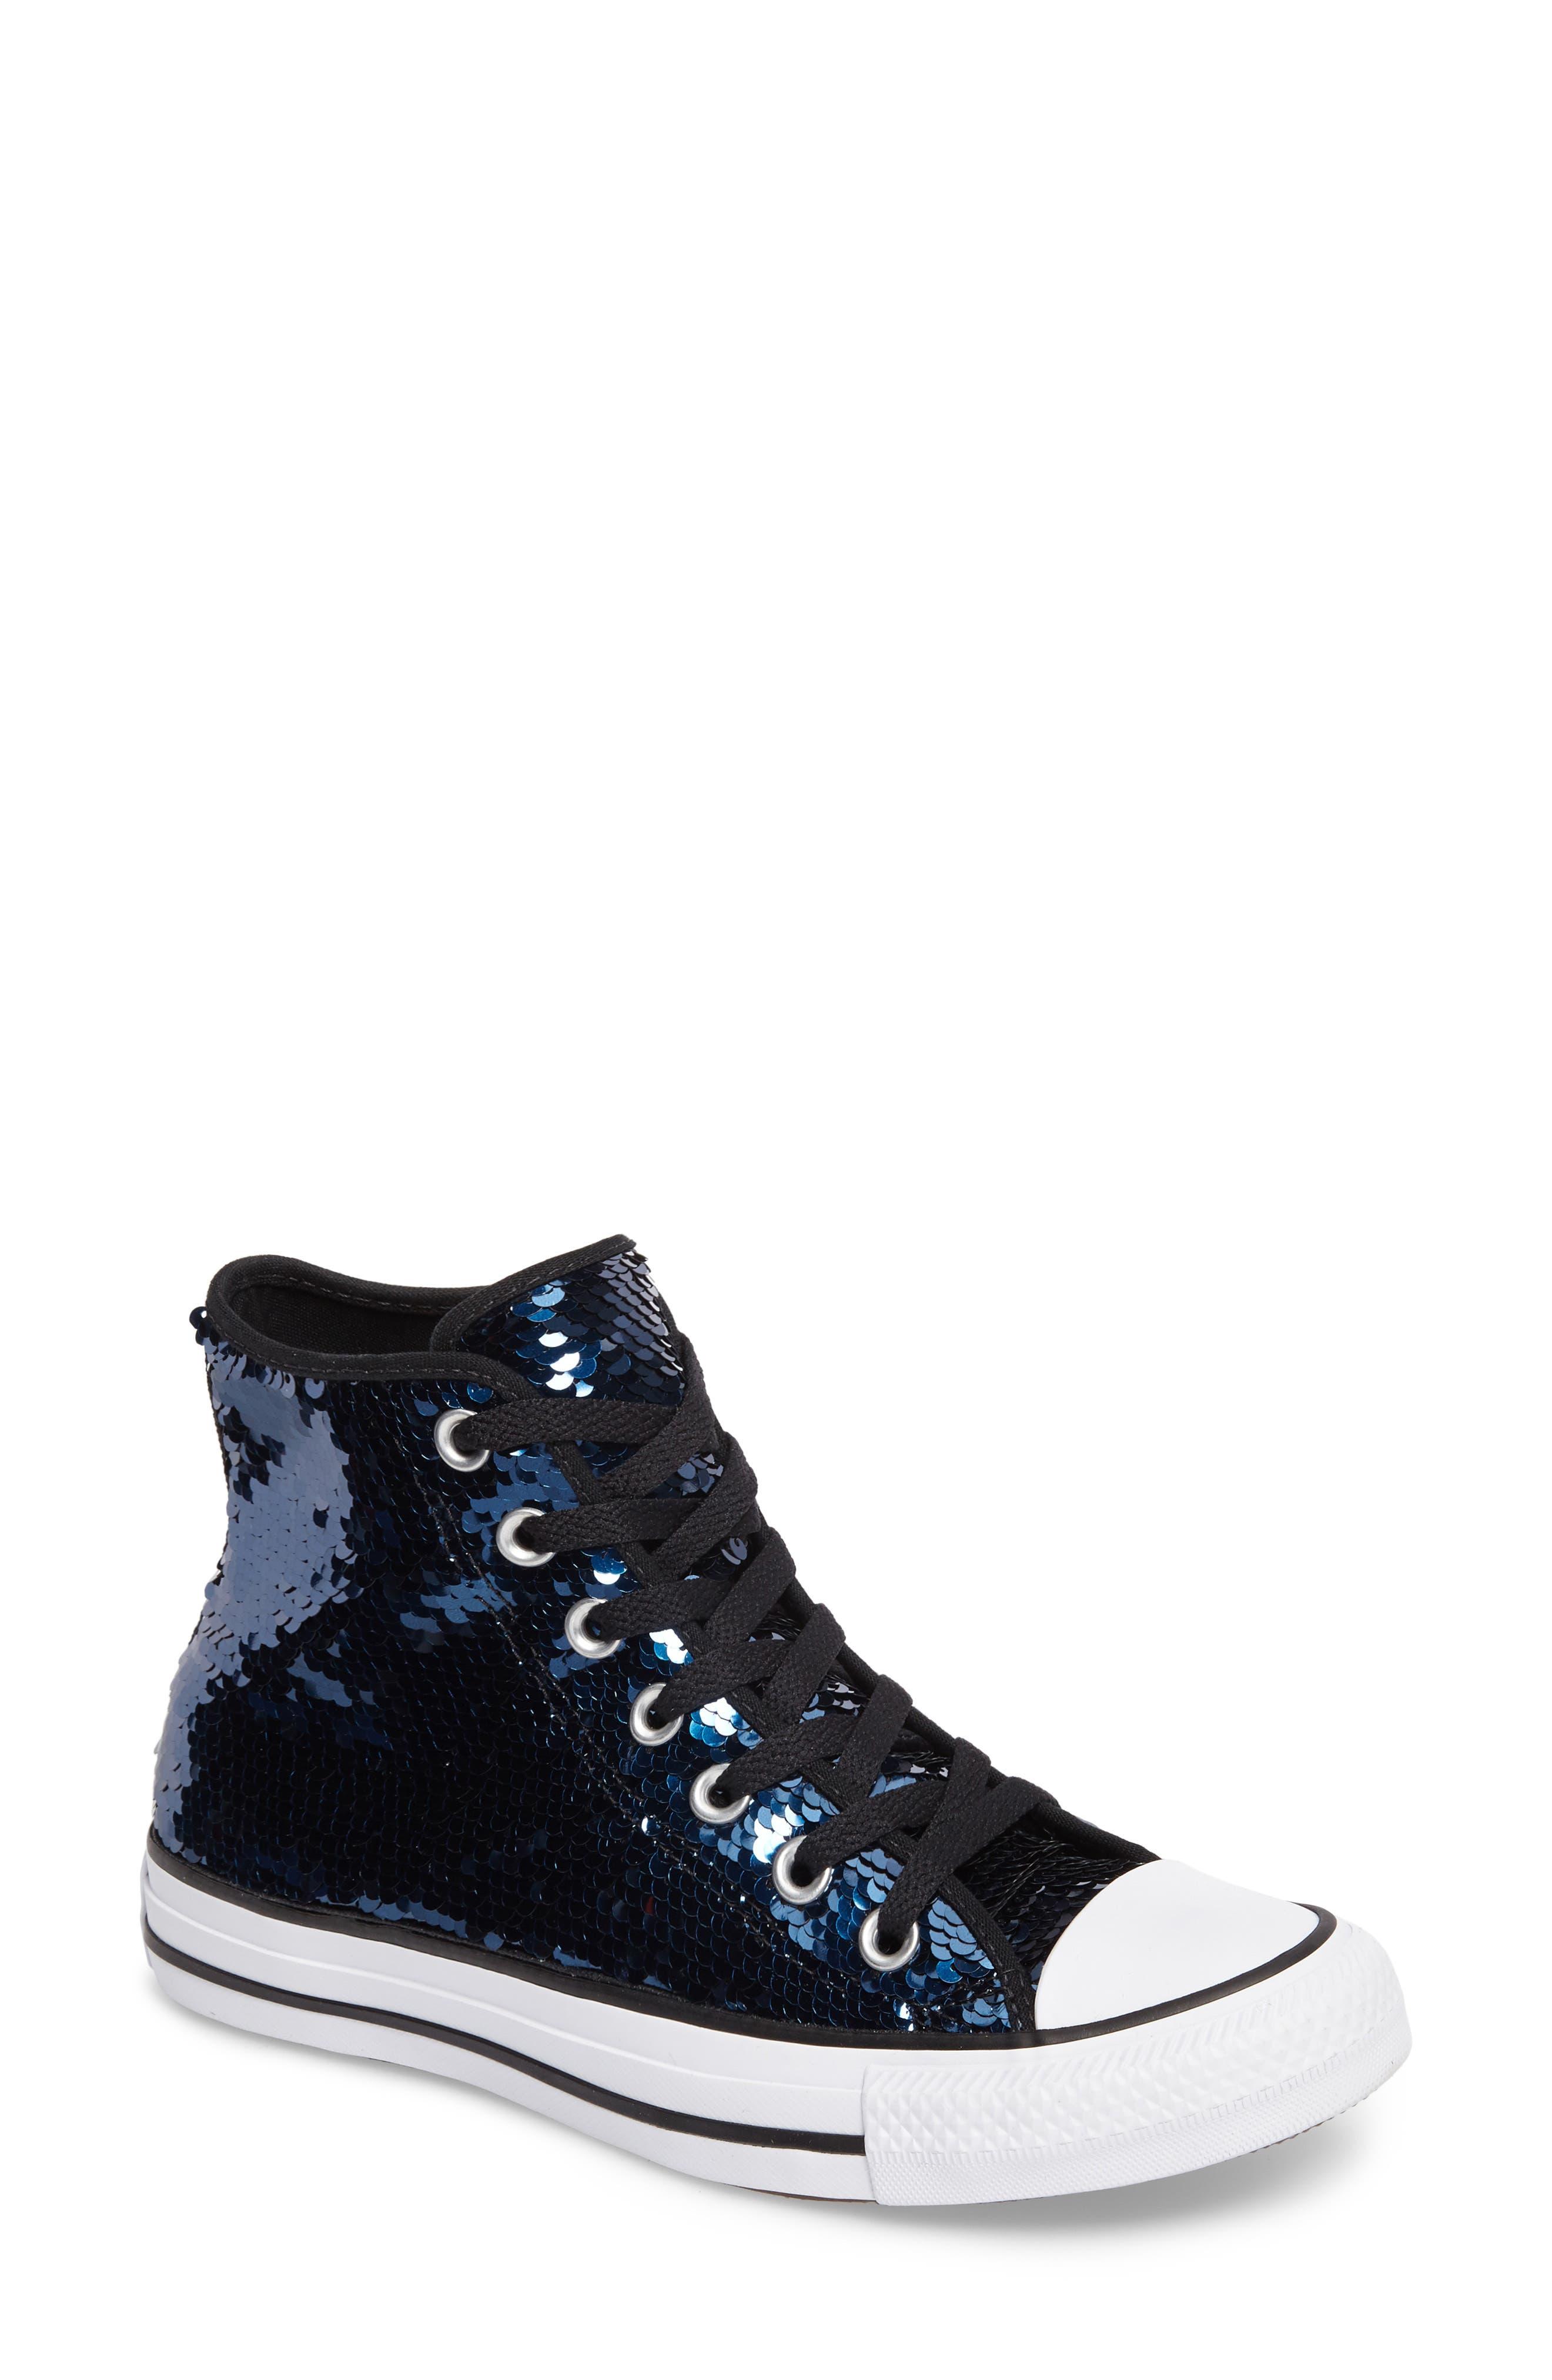 sparkly converse high tops - sochim.com